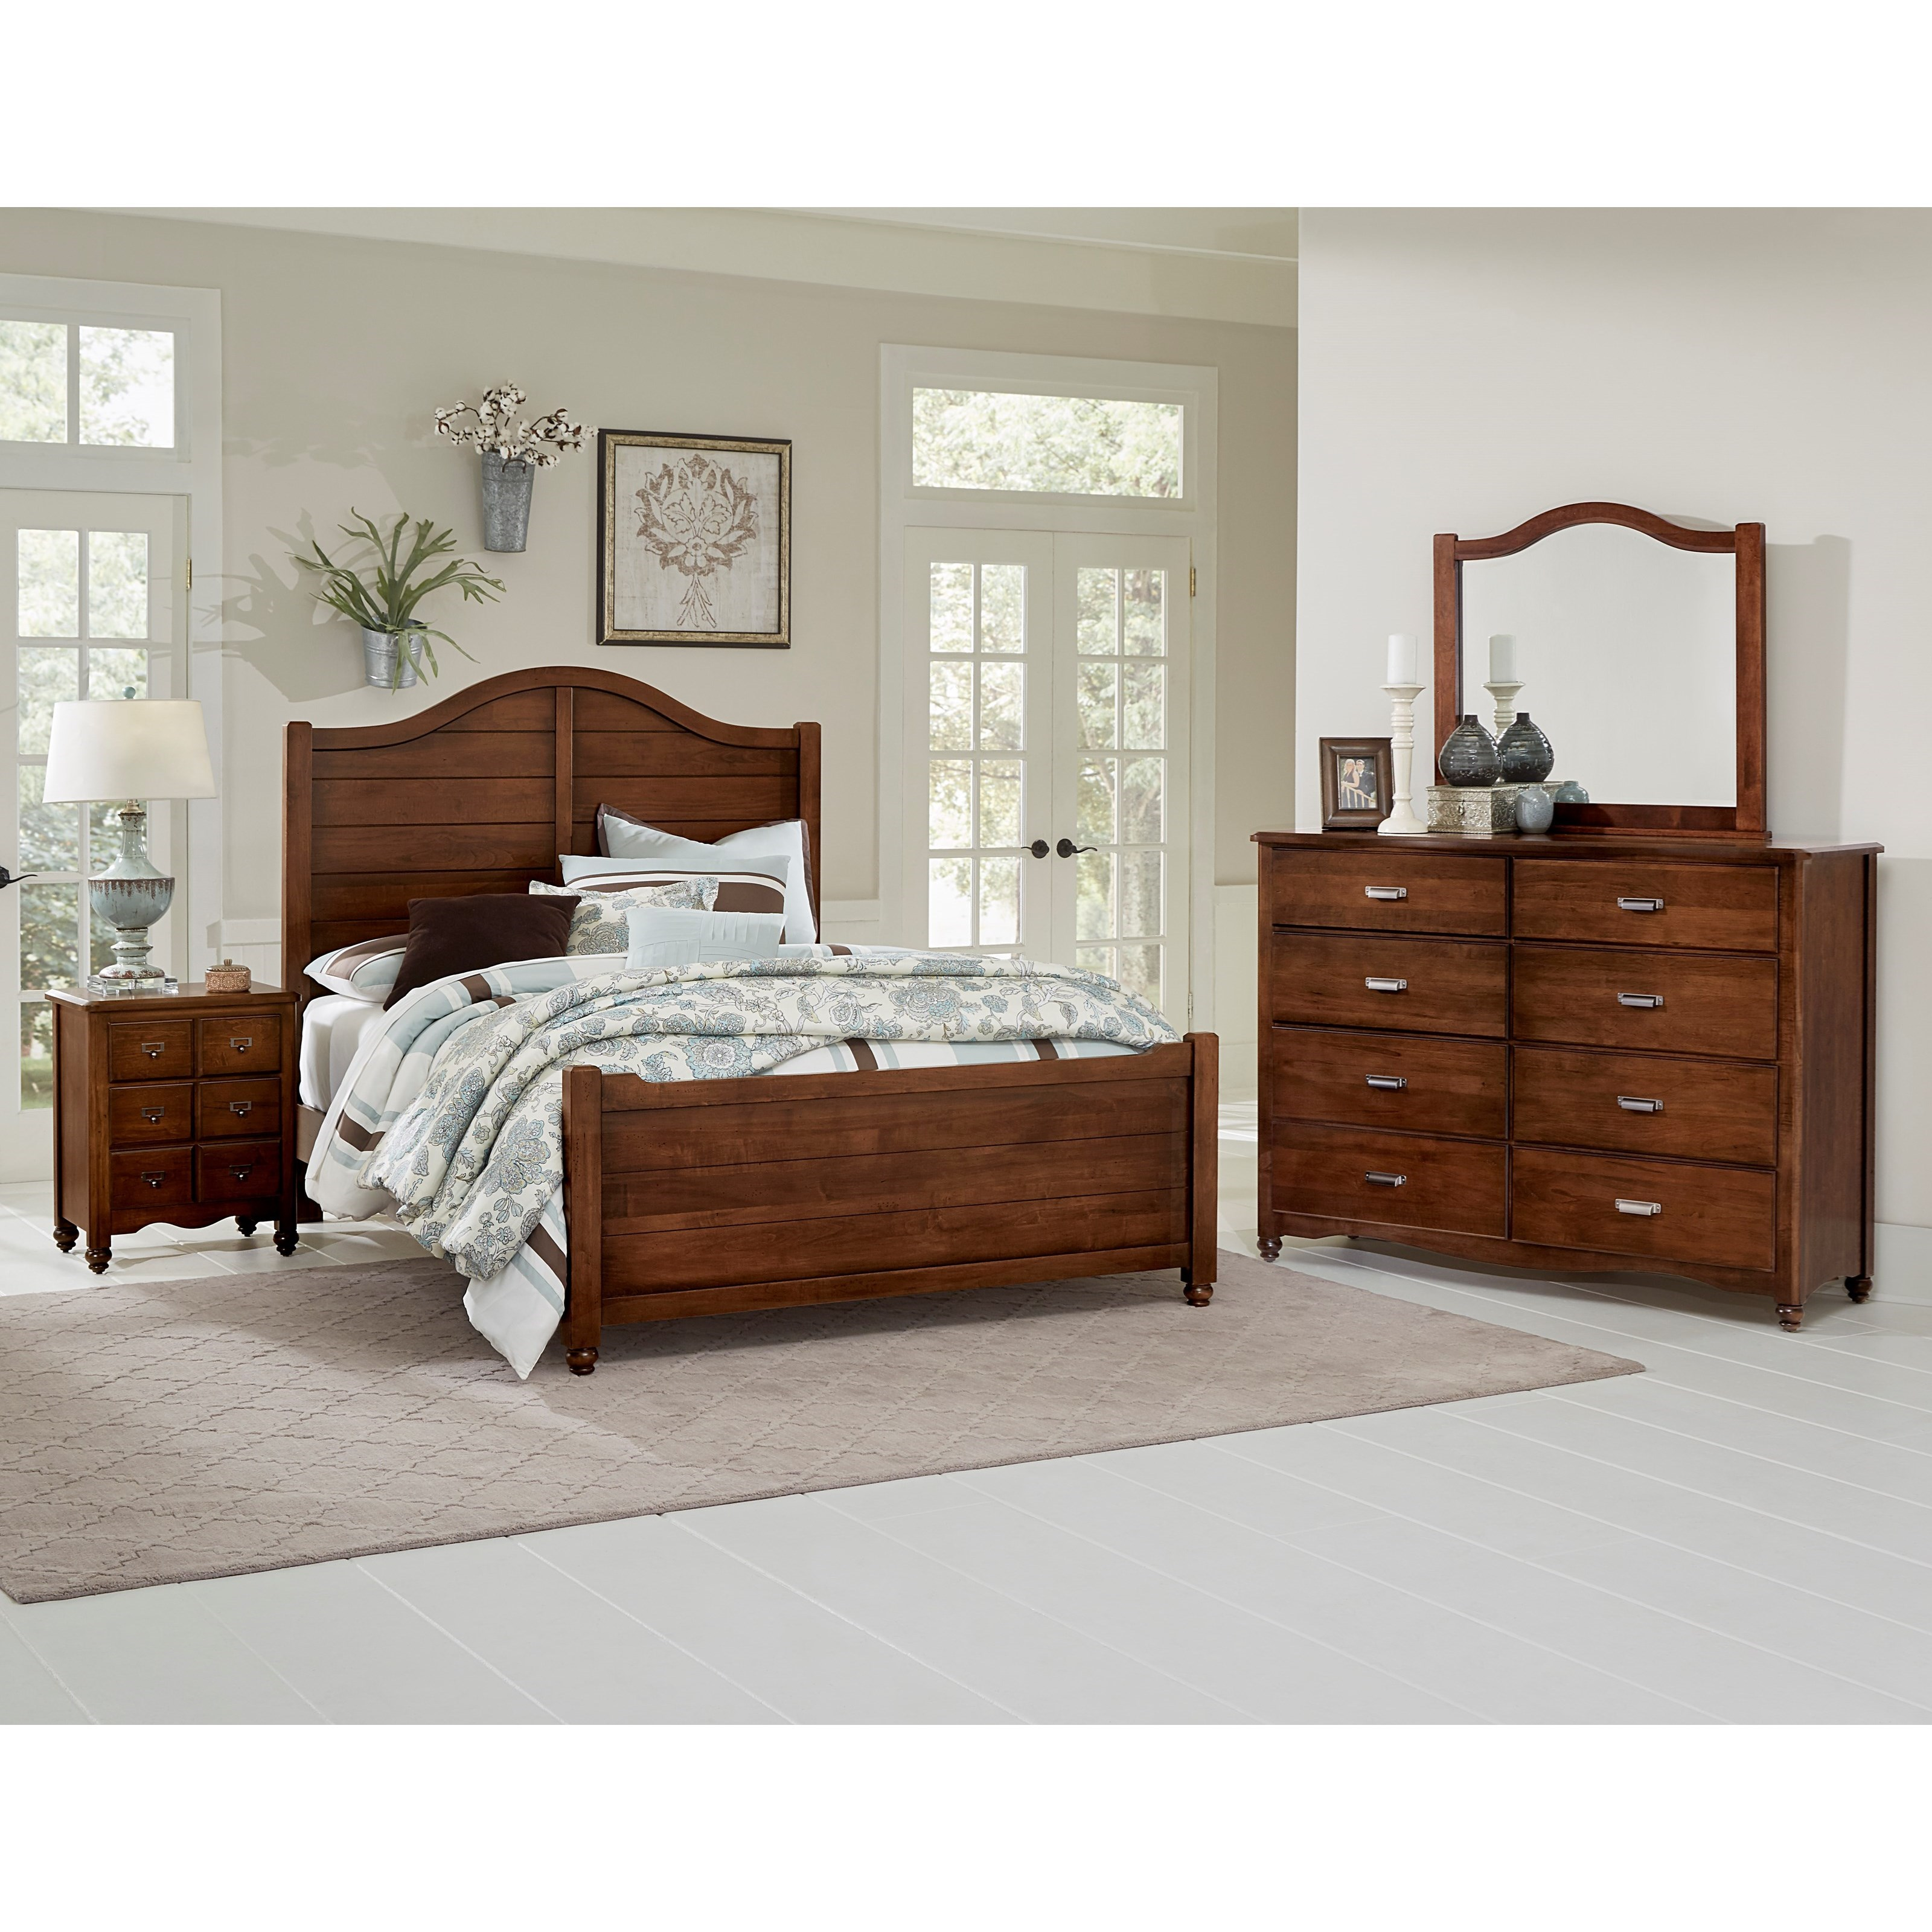 Vaughan bassett american maple solid wood twin shiplap bed